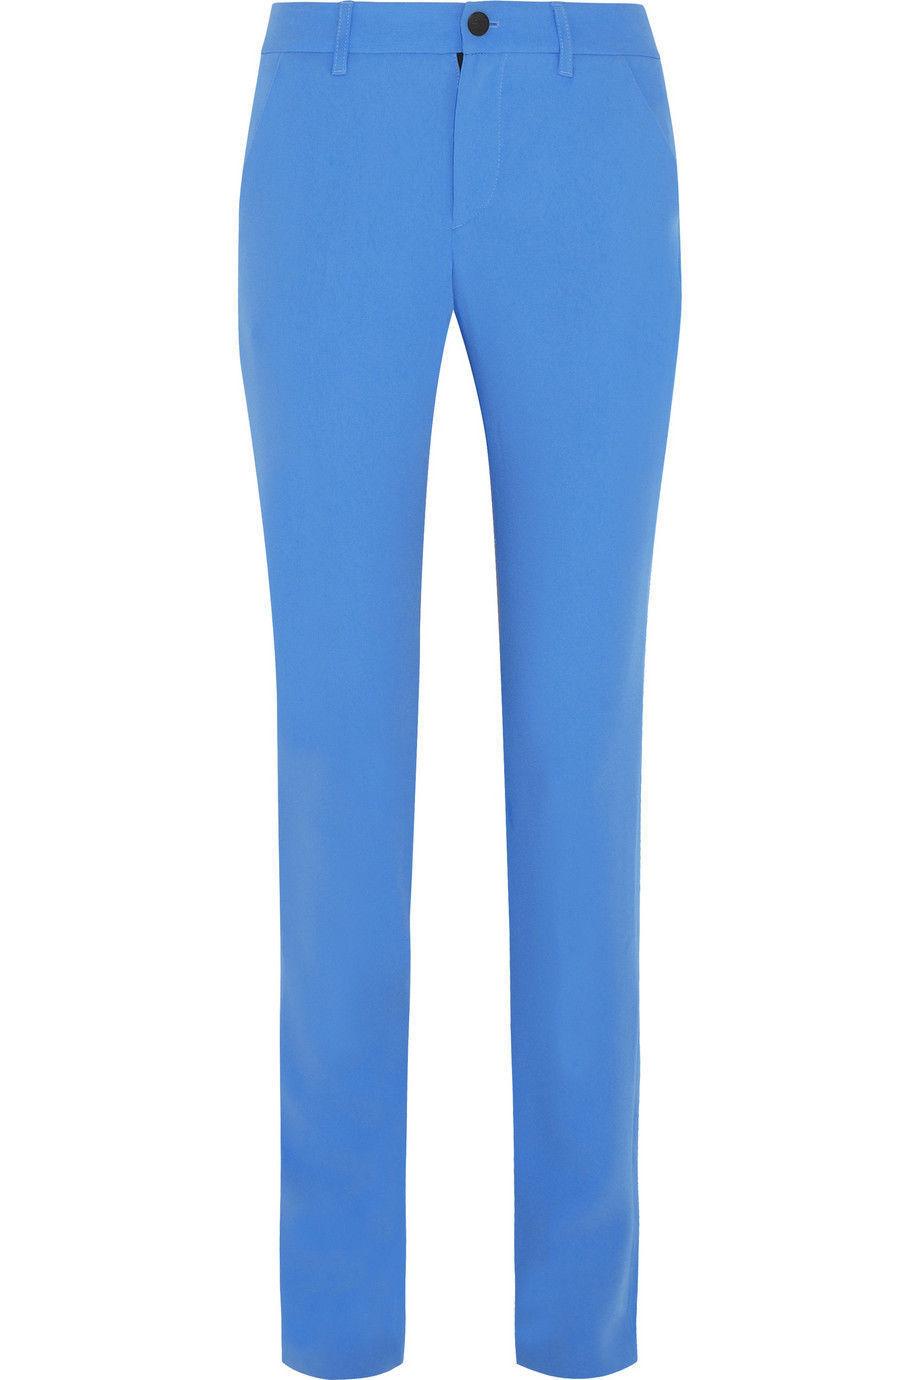 Rag & Bone Eloise Azure bluee satin-crepe slim-leg Pants Size 2 NEW